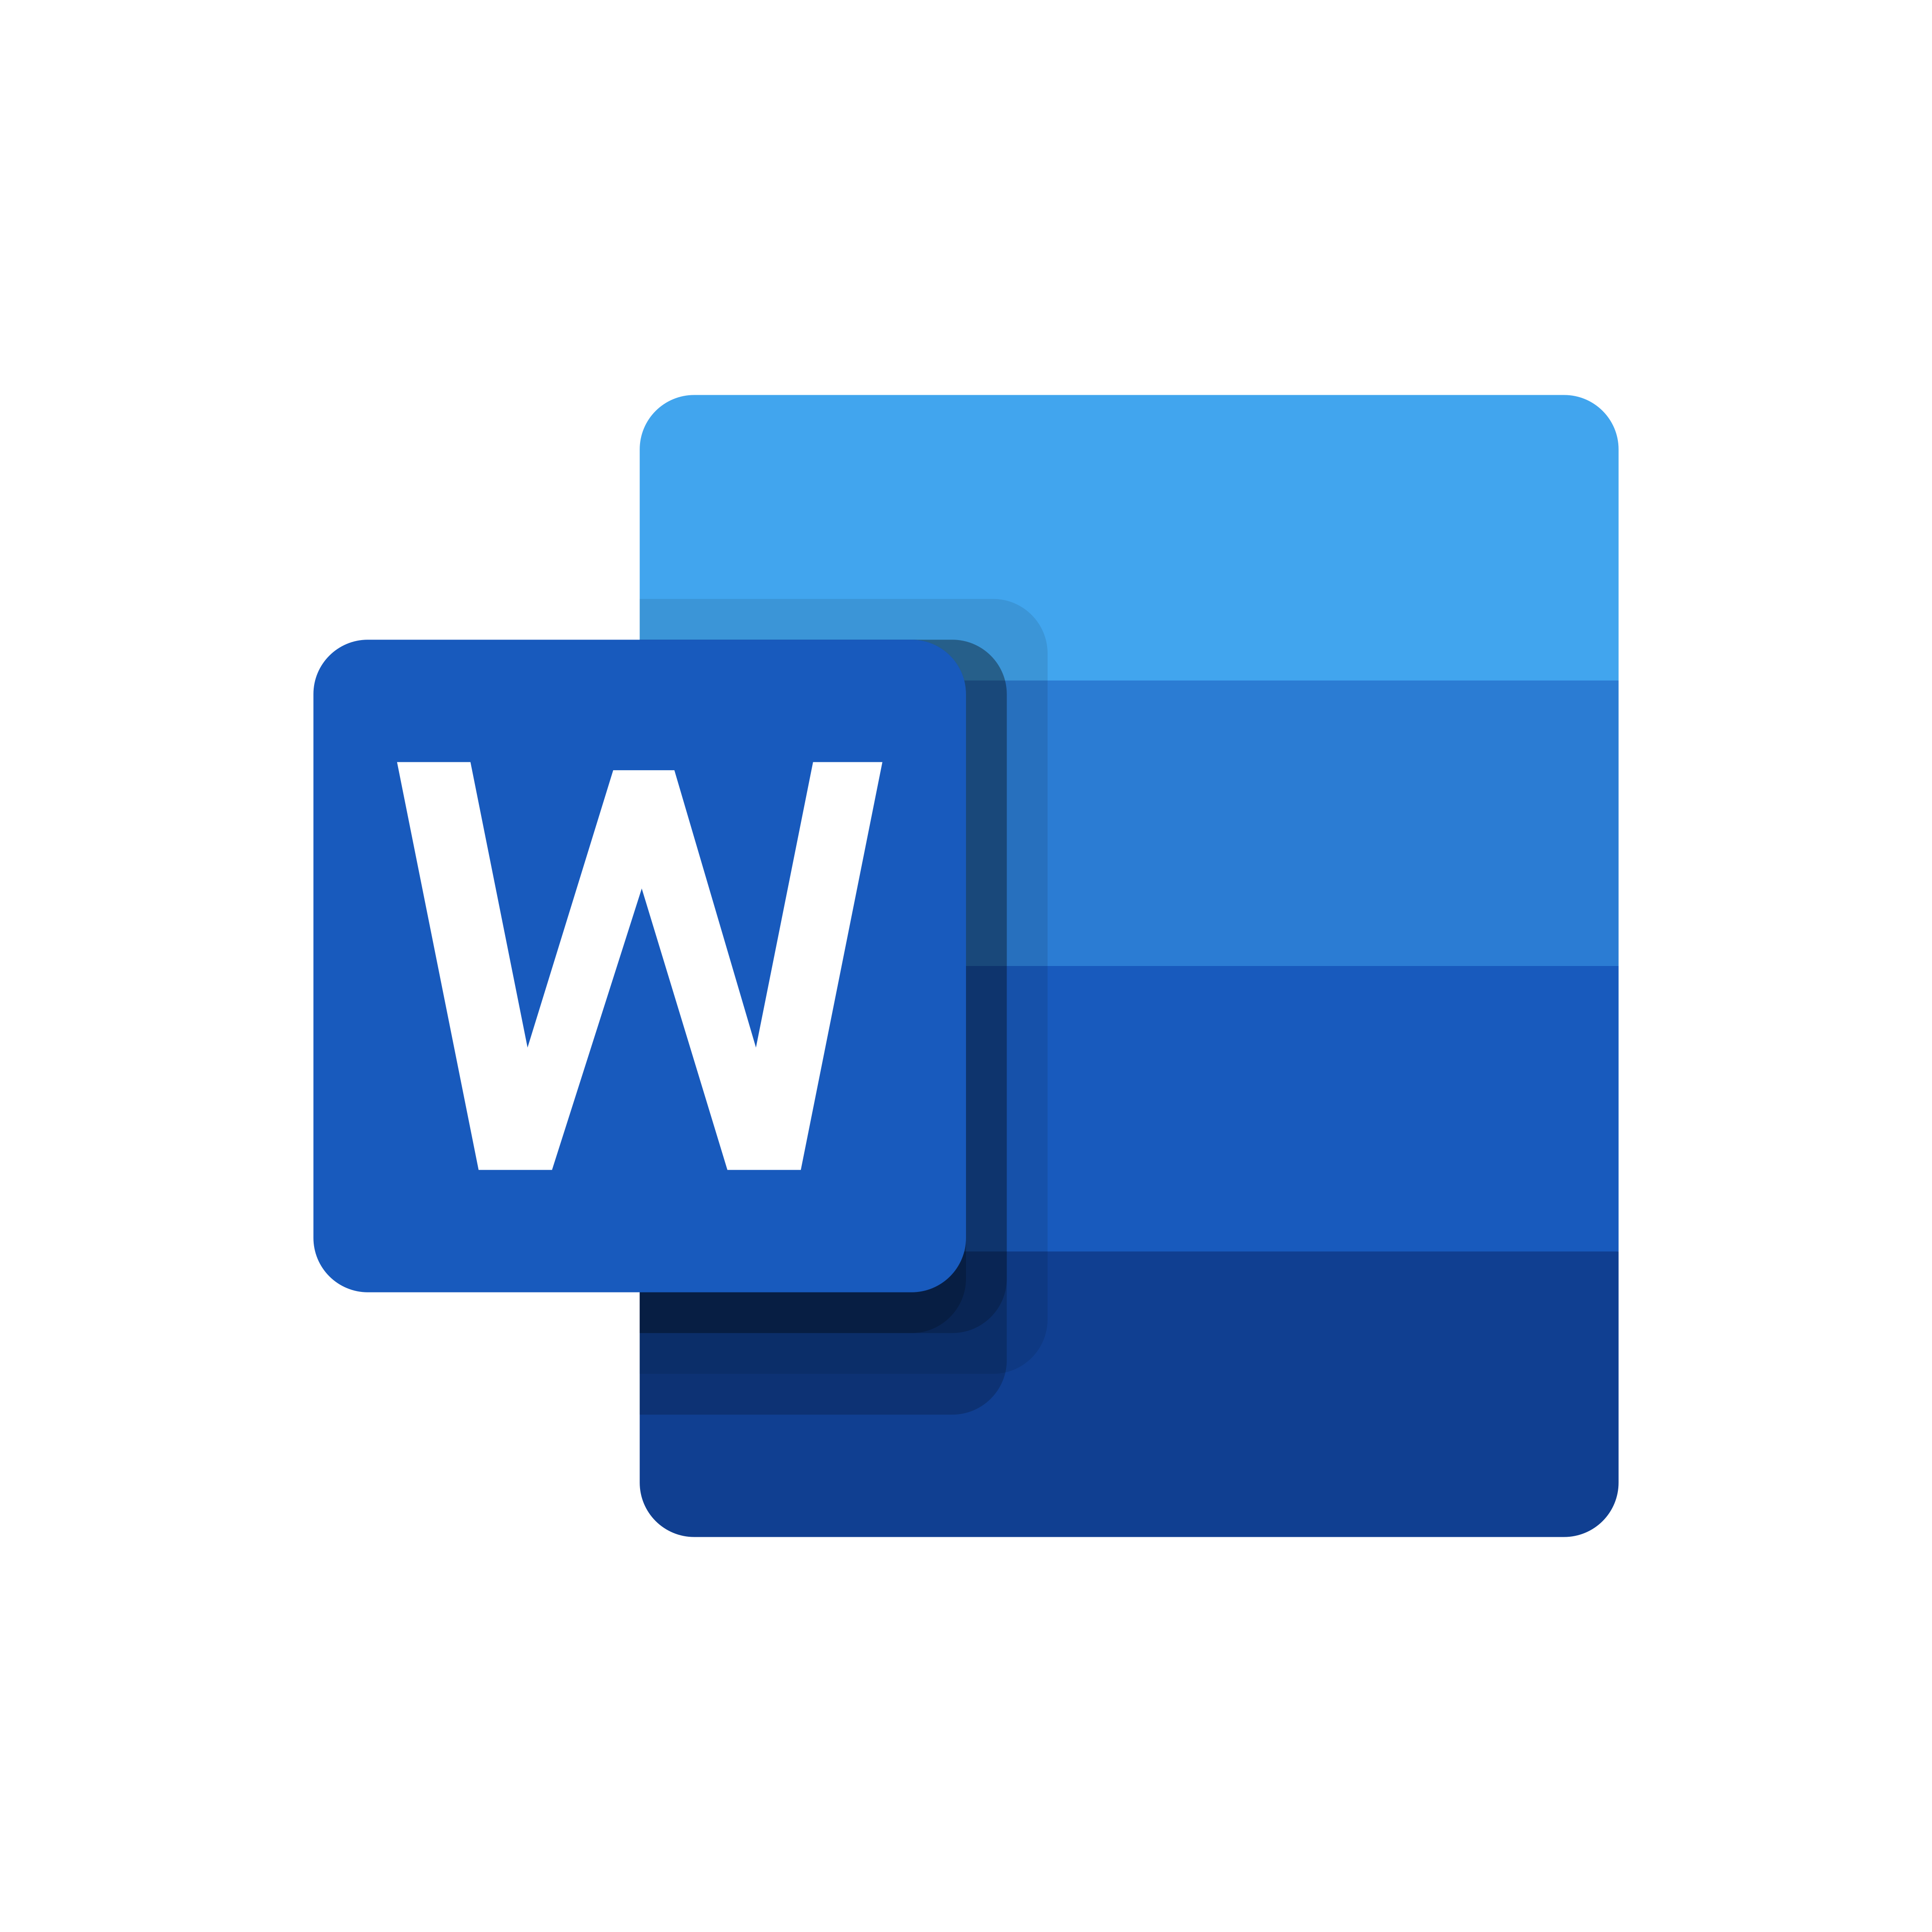 word logo 0 - Microsoft Word Logo